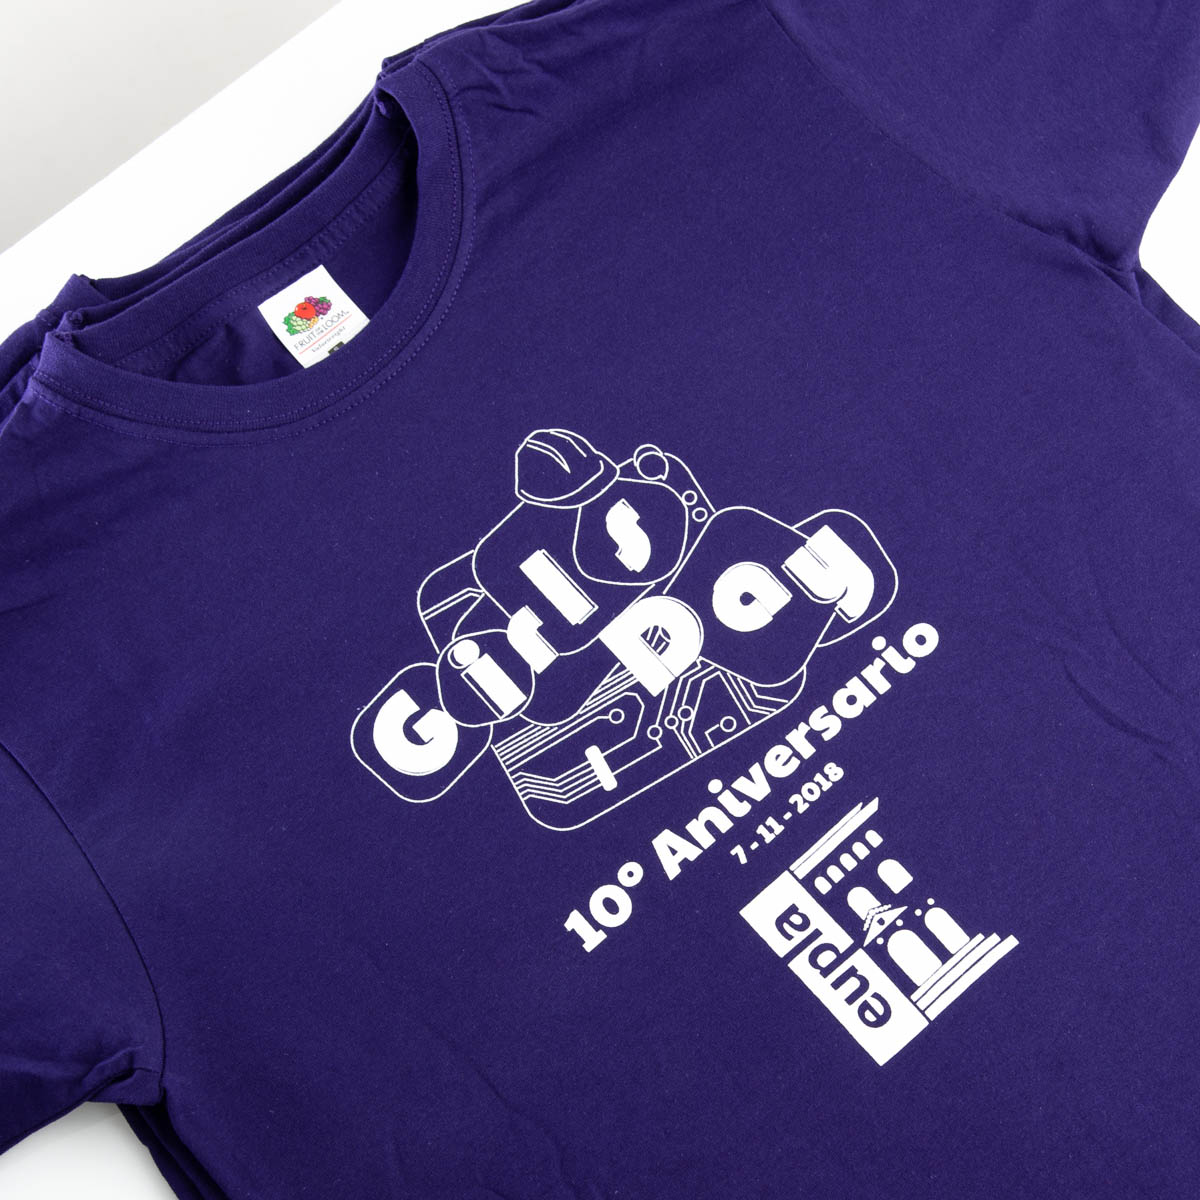 Camisetas personalizadas EUPLA